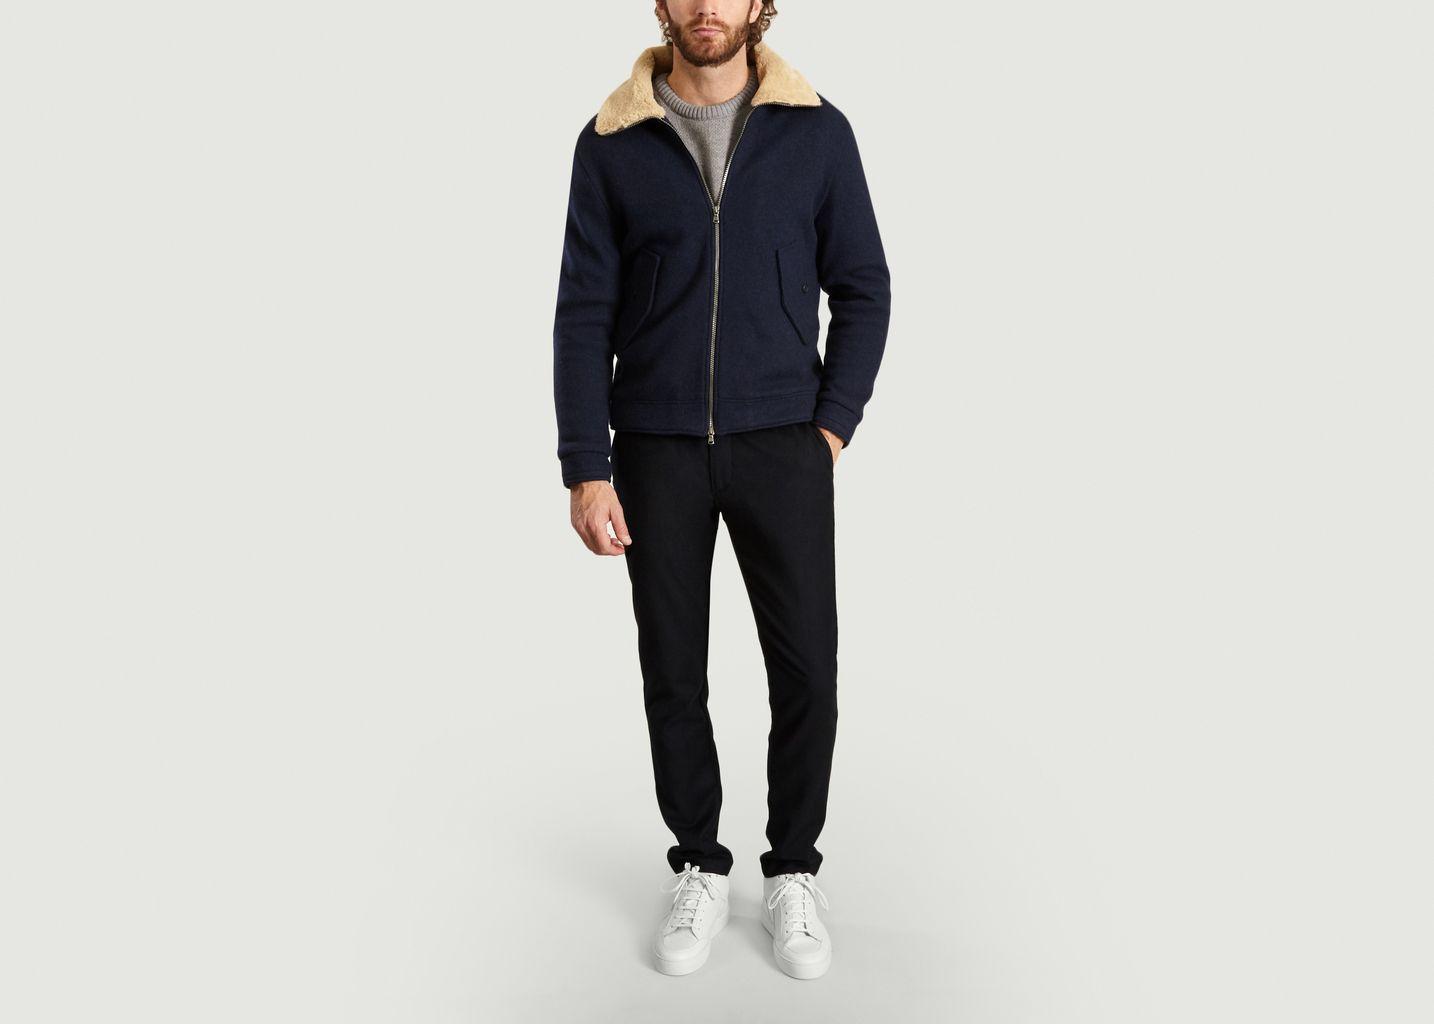 Jacket Smart Wool - JagVi